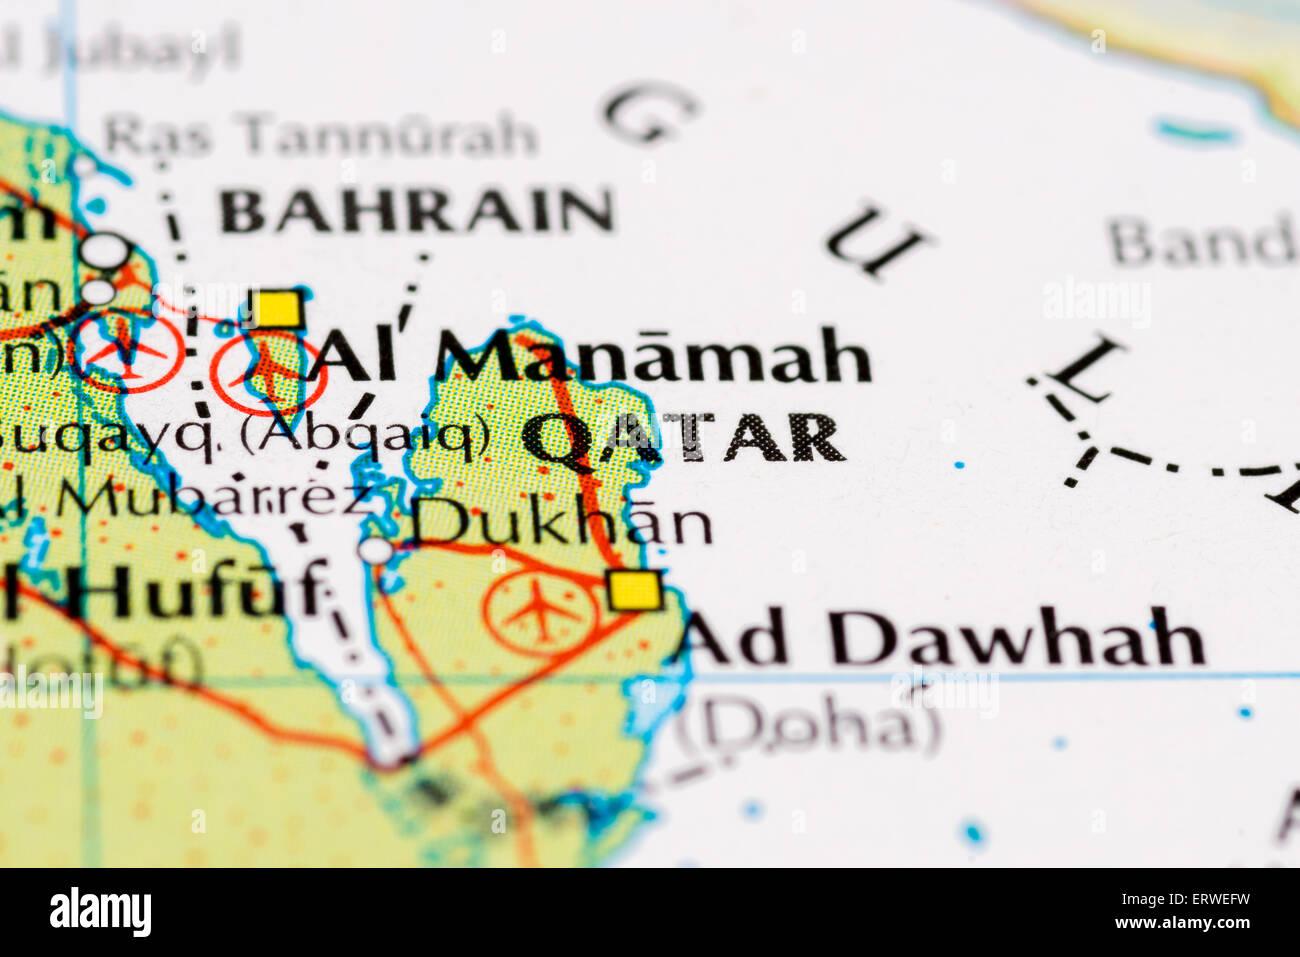 Map Of Qatar Stock Photos & Map Of Qatar Stock Images - Alamy In Doha Qatar Map World on world map brazil, world map uae, world map dubai, world map zaire, world map usa, world map congo, world map kenya, world map west africa, world map jordan, world map western samoa, world map italy, world map iran, world map hanoi vietnam, world map uk, world map malaysia, world map united arab emirates, world map saudi arabia, world map bahrain, world map australia, world map thailand,